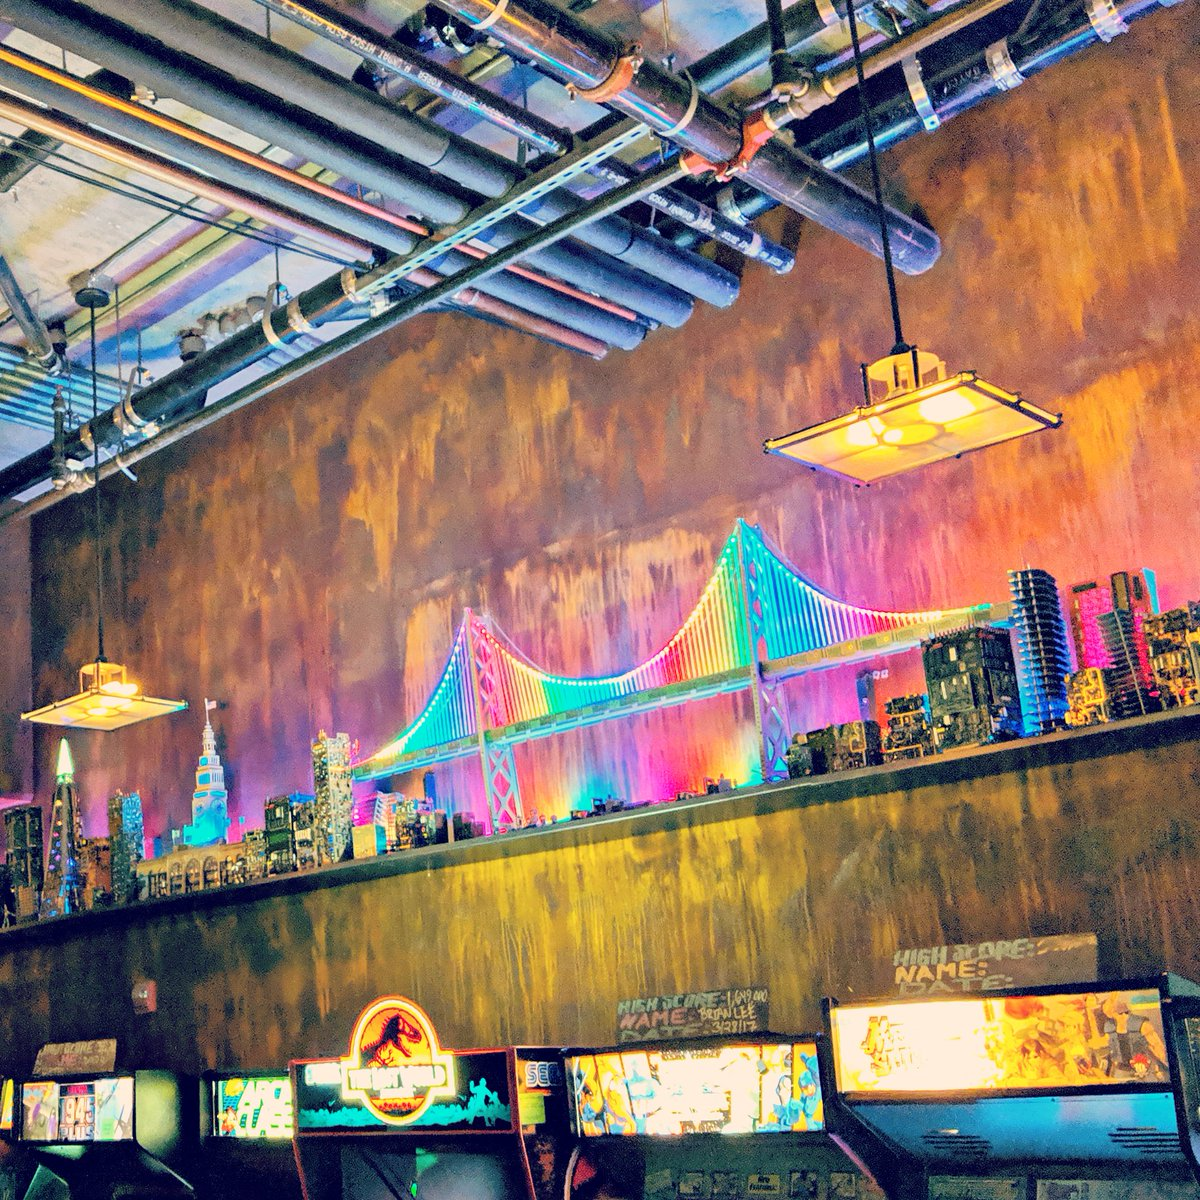 Did someone say @brewcadesf?? I'm always down for #brewcadesf! Let's go!!!  #sanfrancisco #arcade #adultarcade #drinks #insertcoins #pinballwizard #pinball #goldengatebridge #rainbow #rainbowlights #myfav #sofun #castro #local #locallove #skyline  https:// bayareabeautyblogger.com/2019/01/23/how -to-live-a-sustainable-lifestyle-with-kids/  …  <br>http://pic.twitter.com/1fddoGjcYv